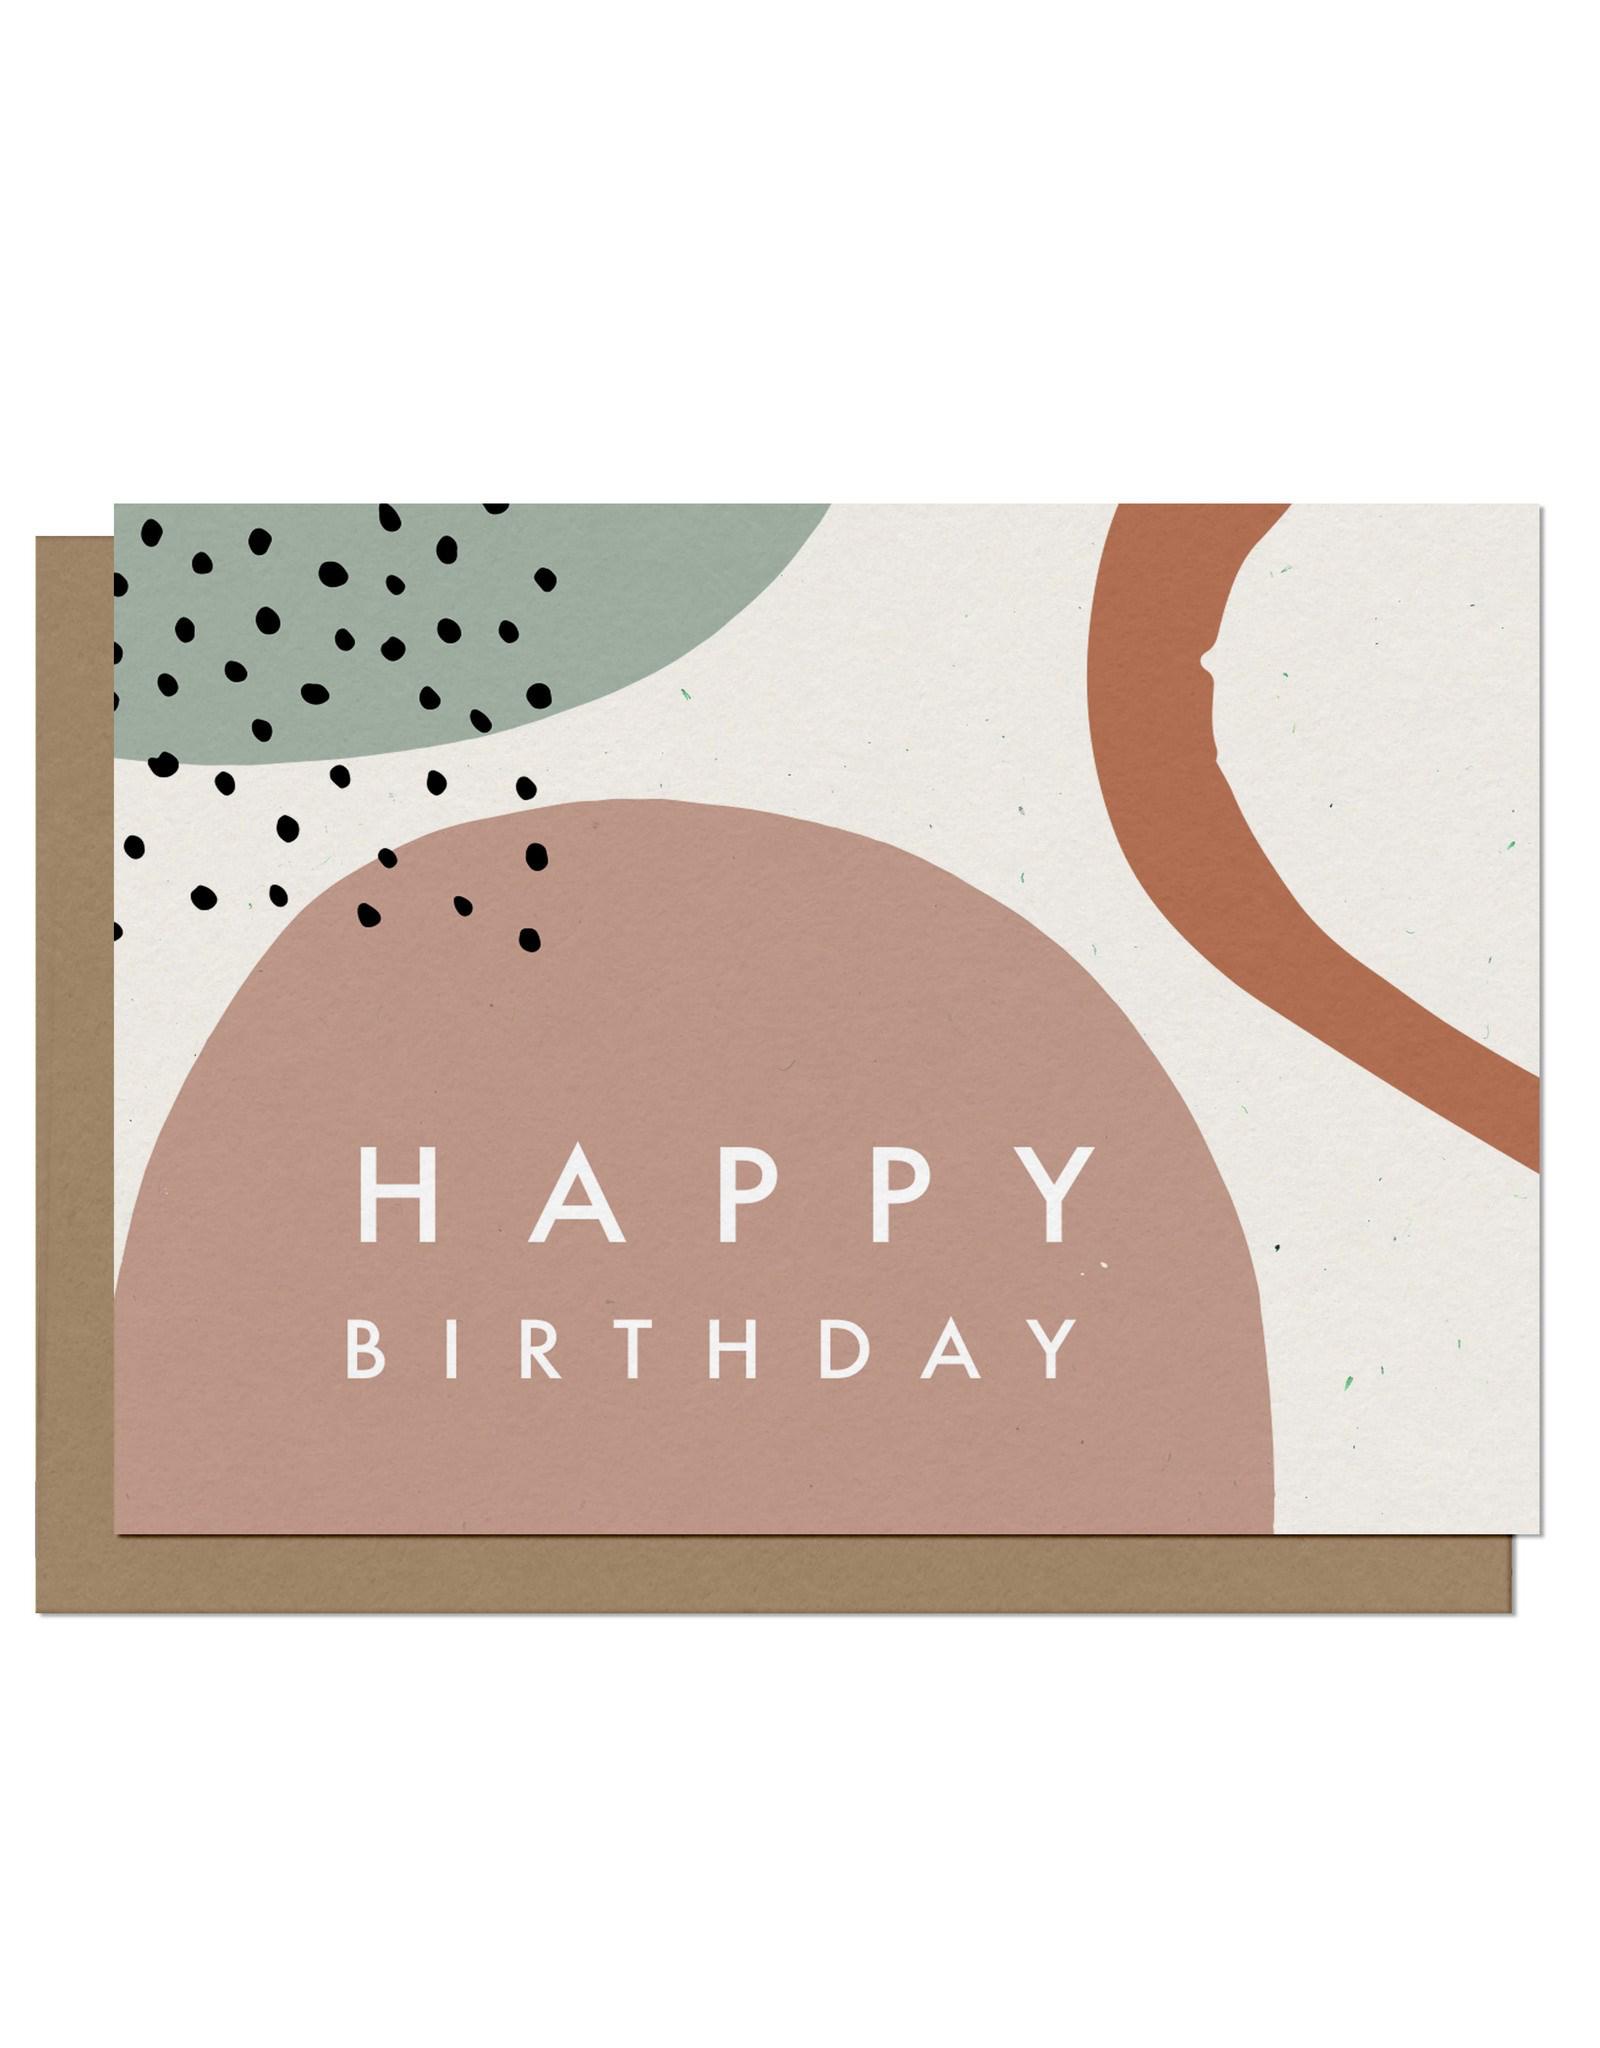 Paper E Clips Paper E Clips Happy Birthday Wishes Card-SG008